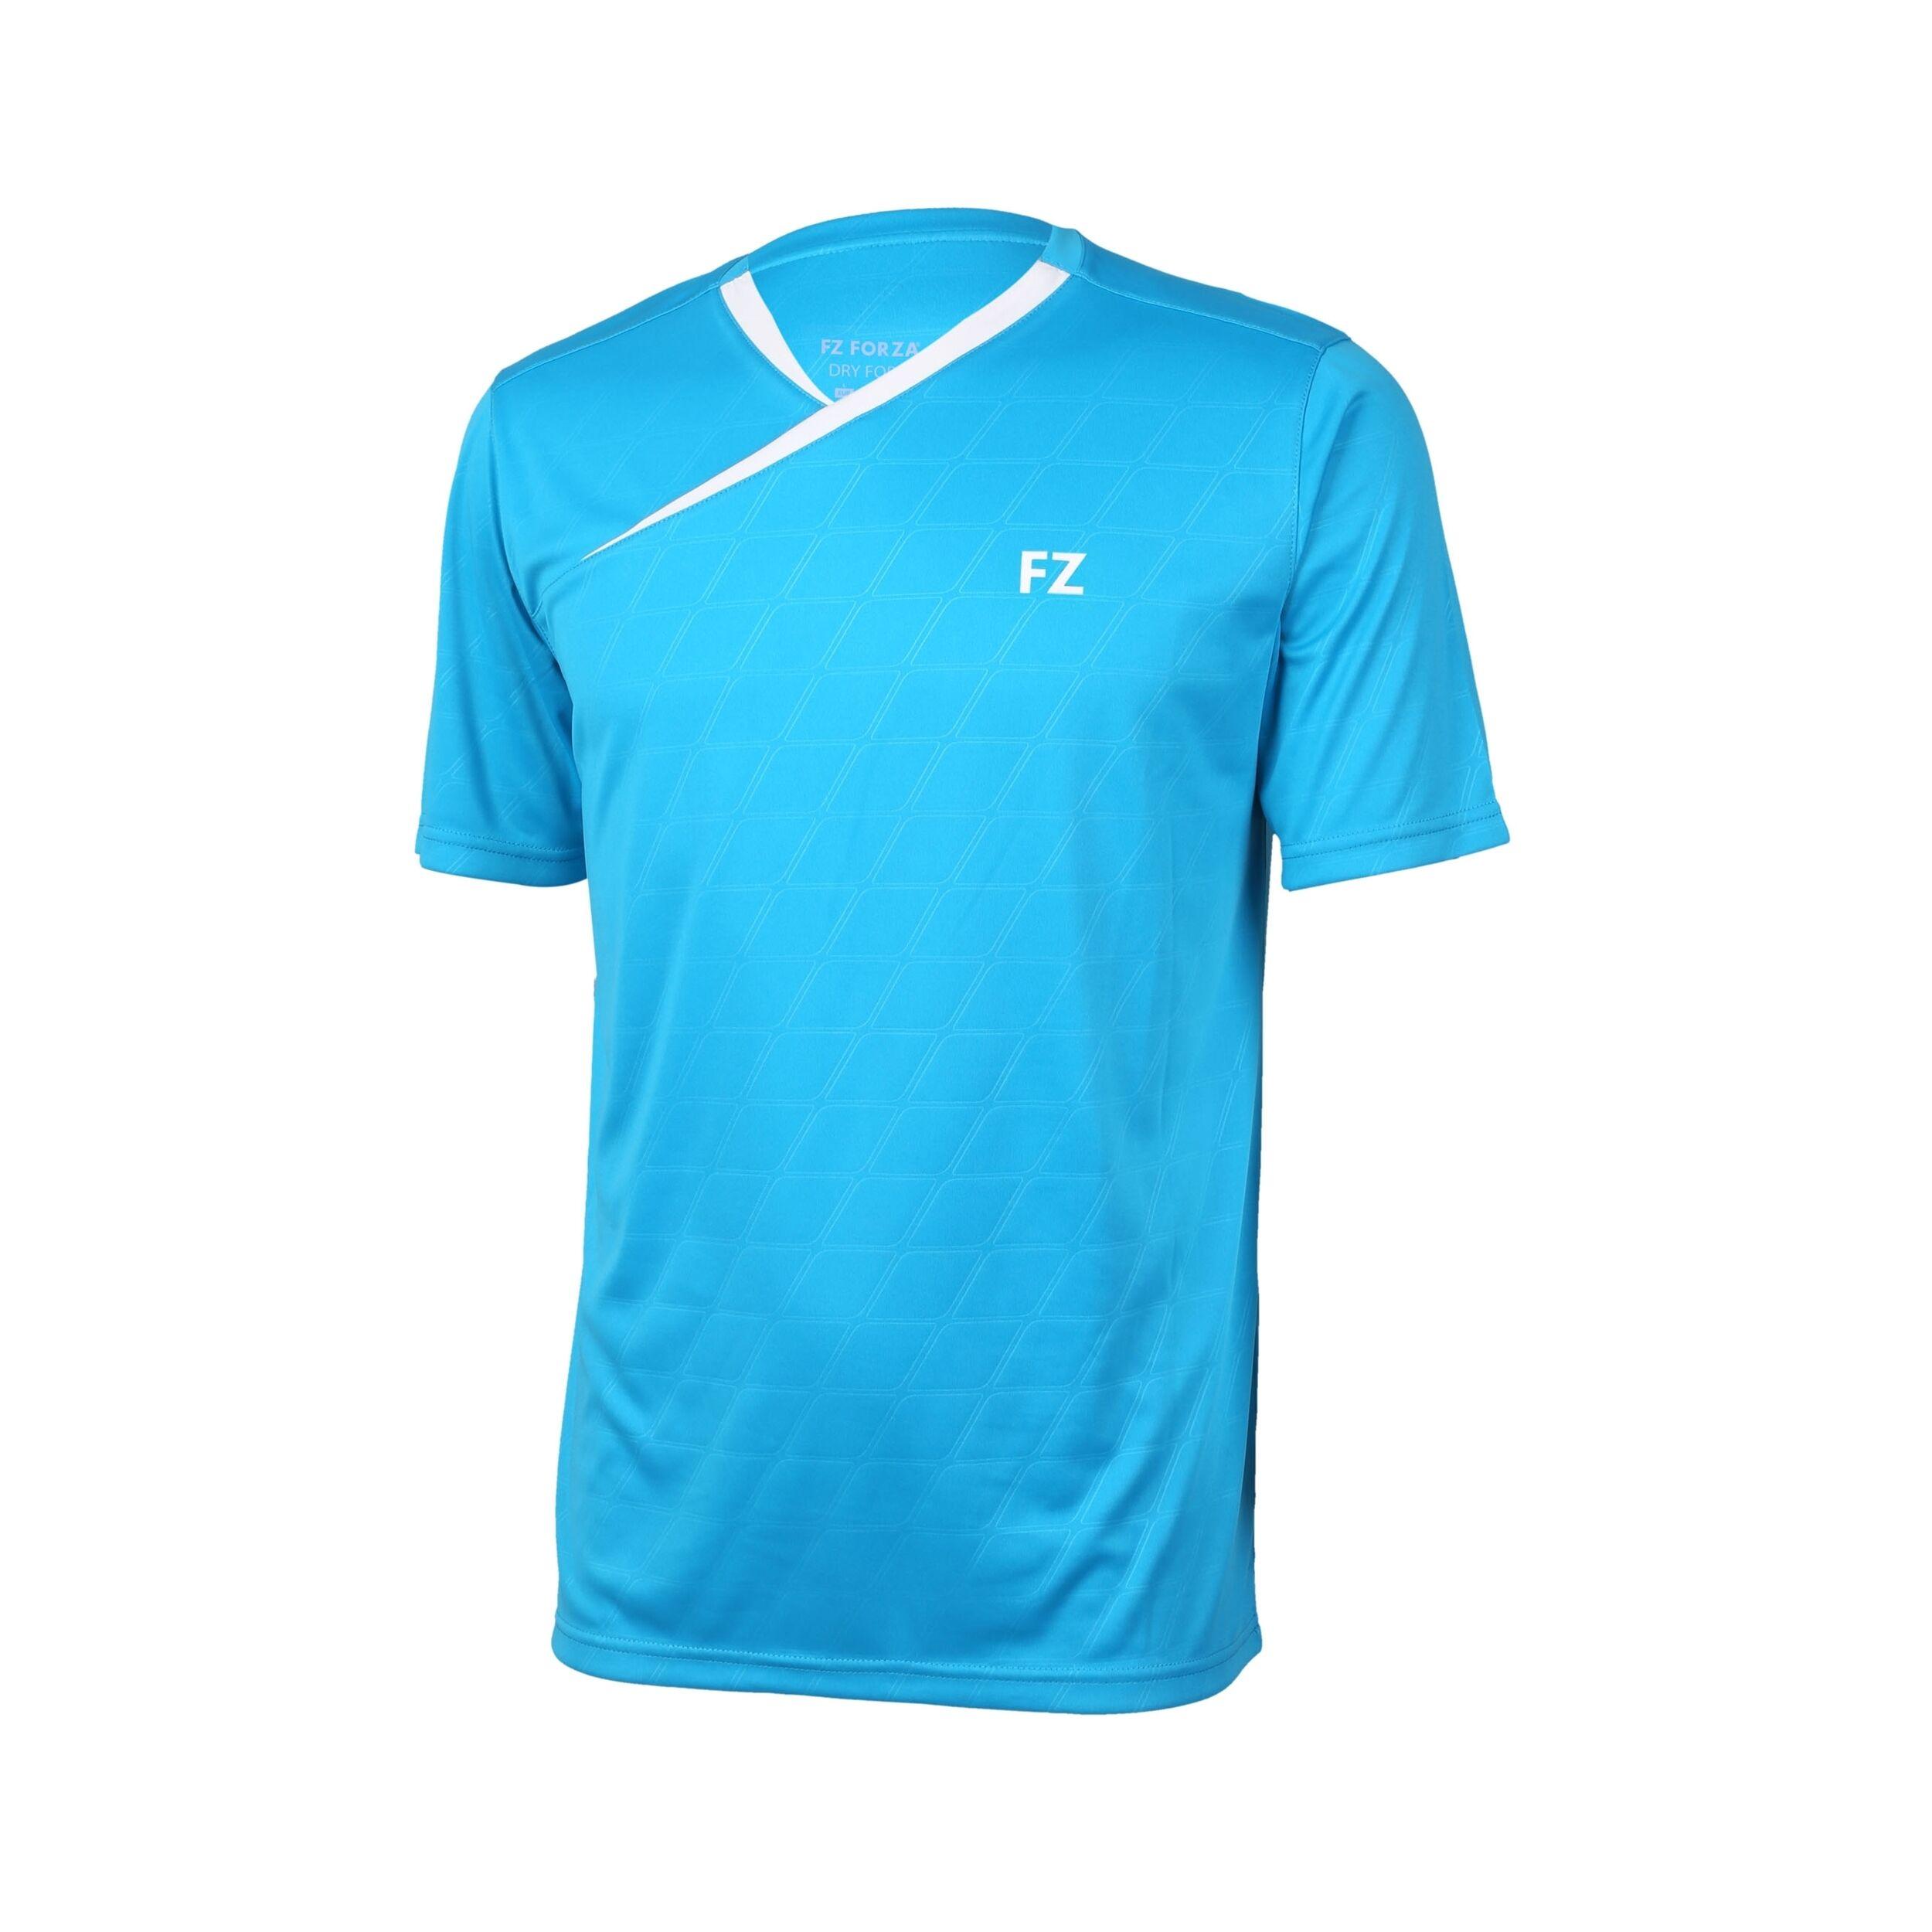 FZ Forza Byron T-shirt Atomic Teal XL